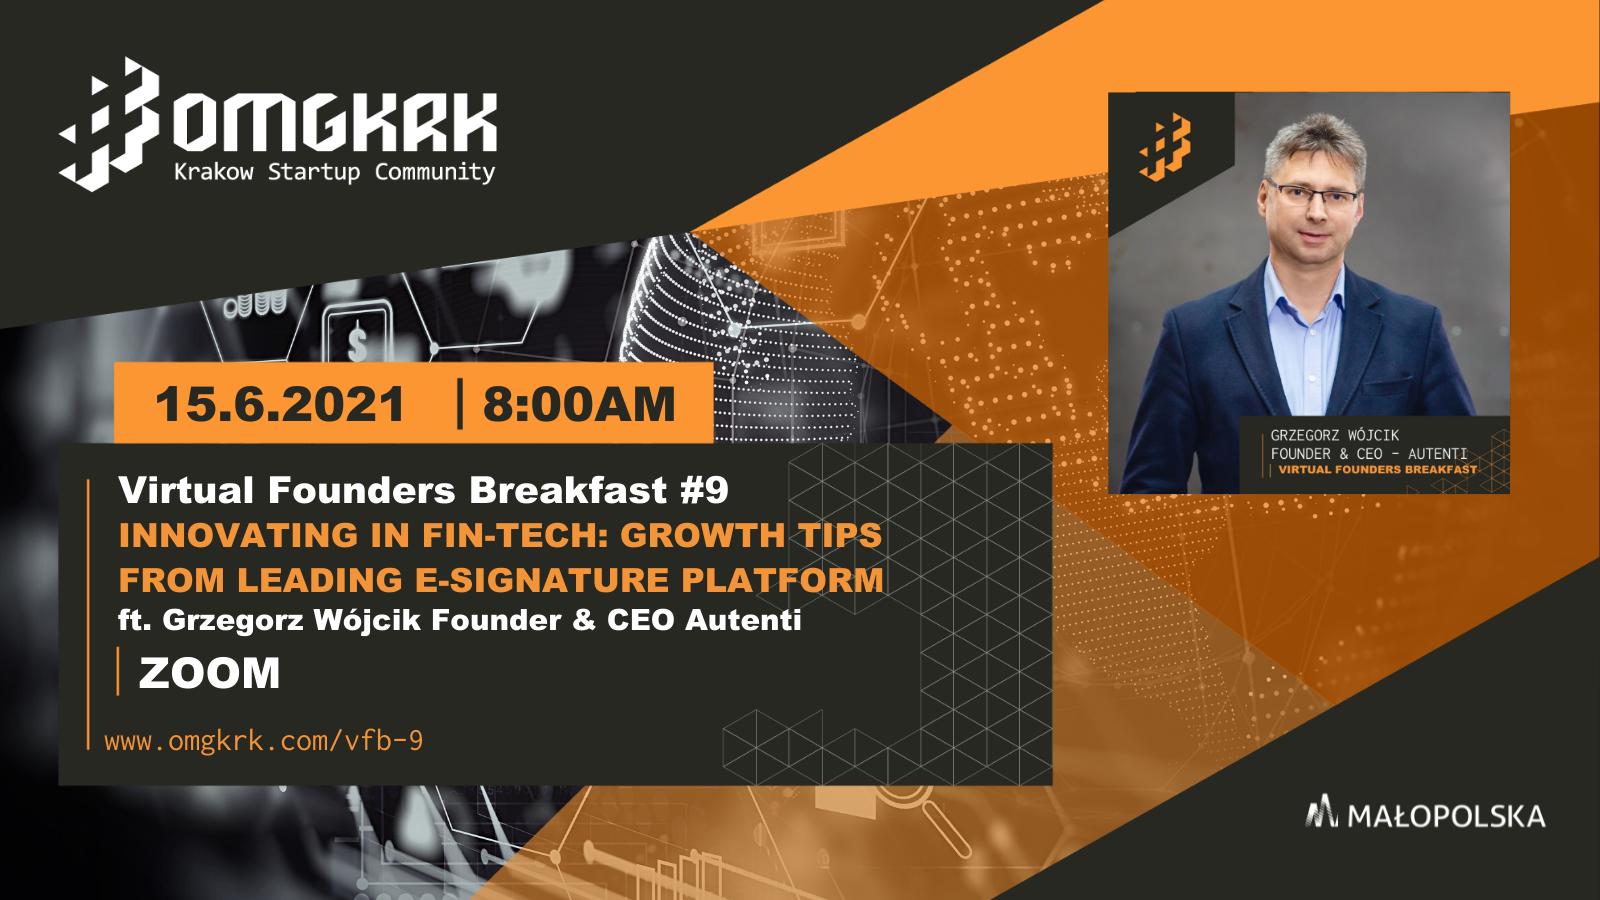 , Virtual Founders Breakfast #9 Innovating In Fin-Tech: Growth Tips From Leading E-Signature Platform ft. Grzegorz Wójcik CEO Autenti